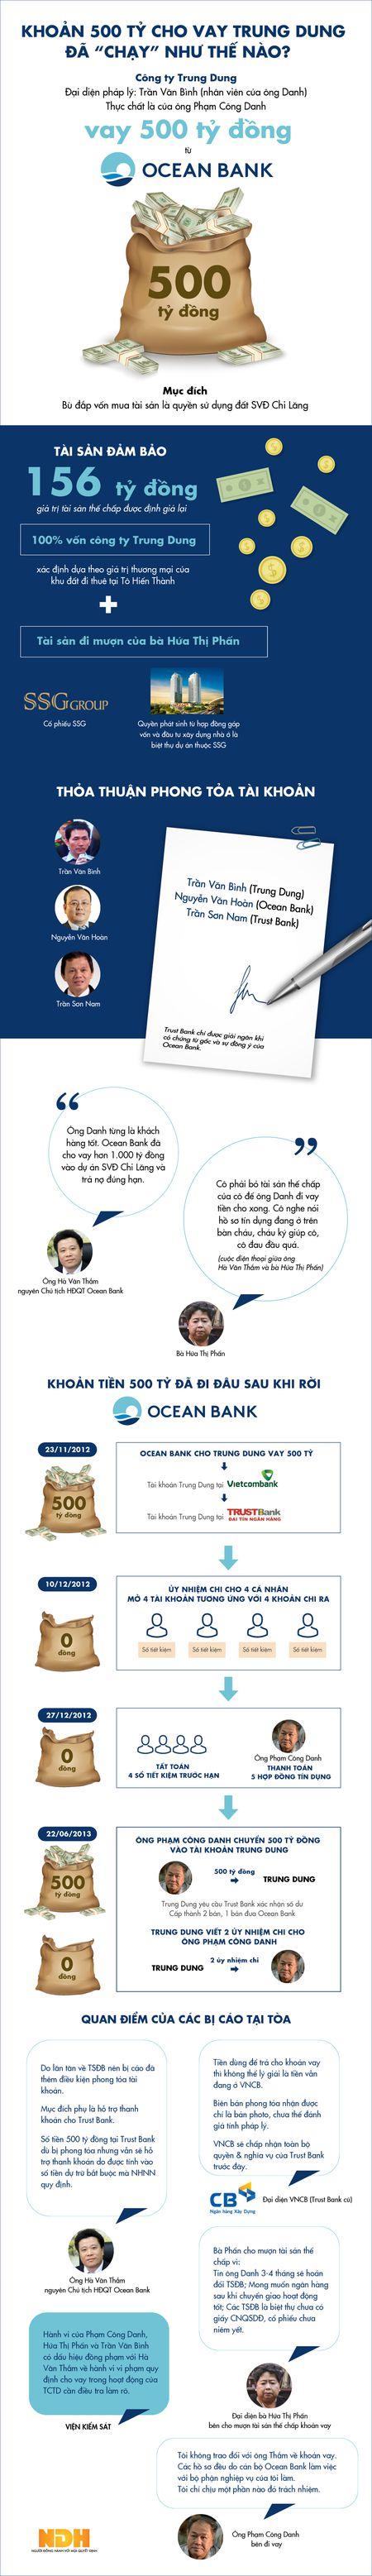 500 ty dong 'boc hoi' - gach noi giua hai dai an ngan hang - Anh 1